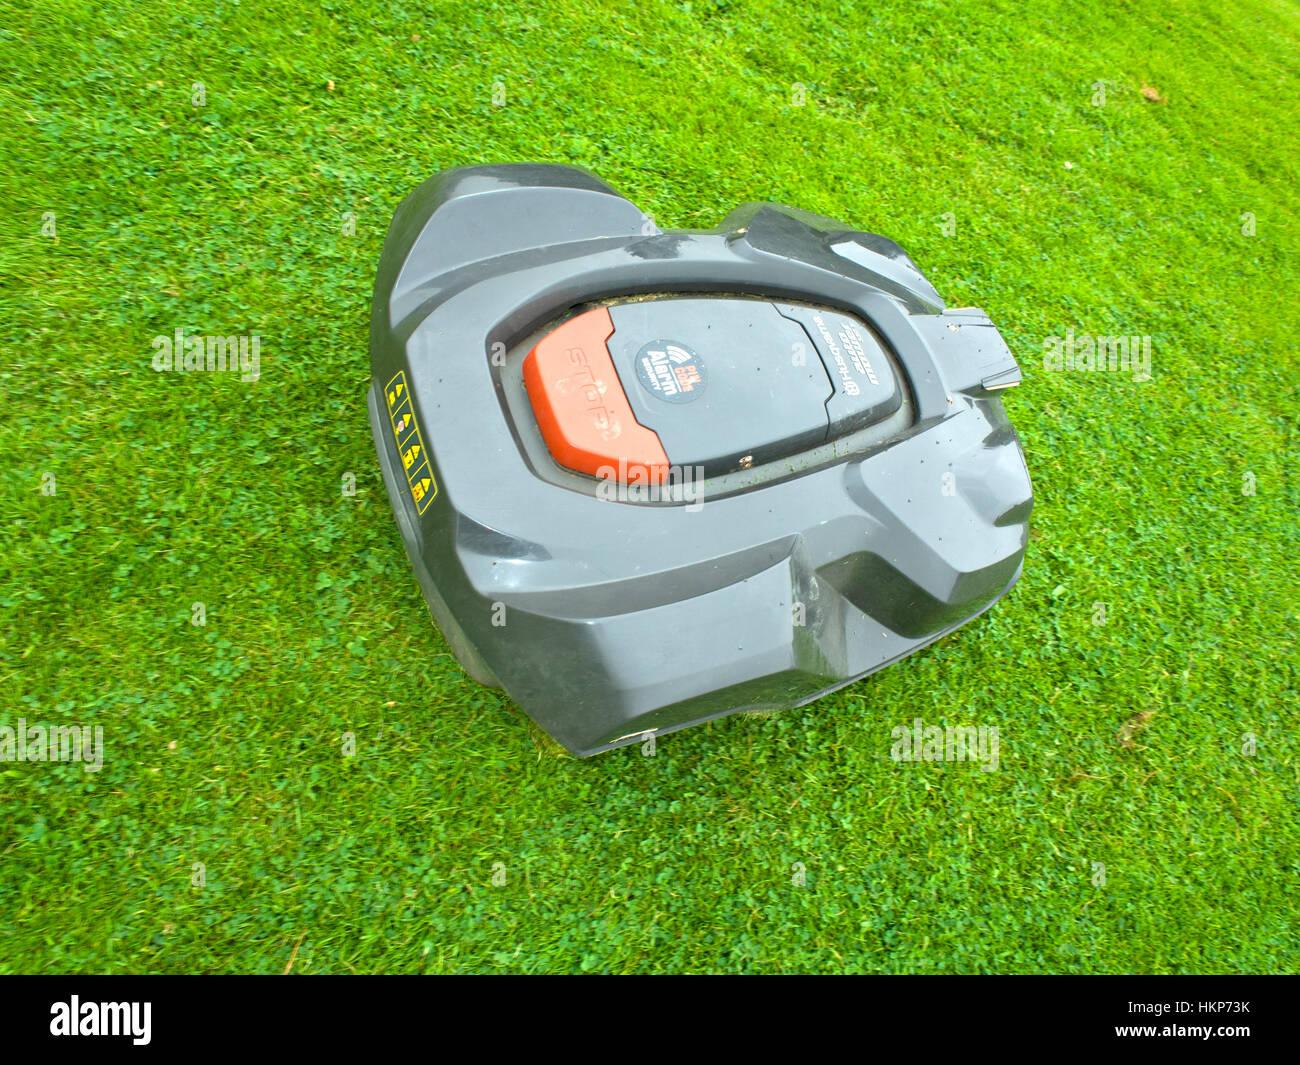 Husqvarna automower cutting lawn - Stock Image